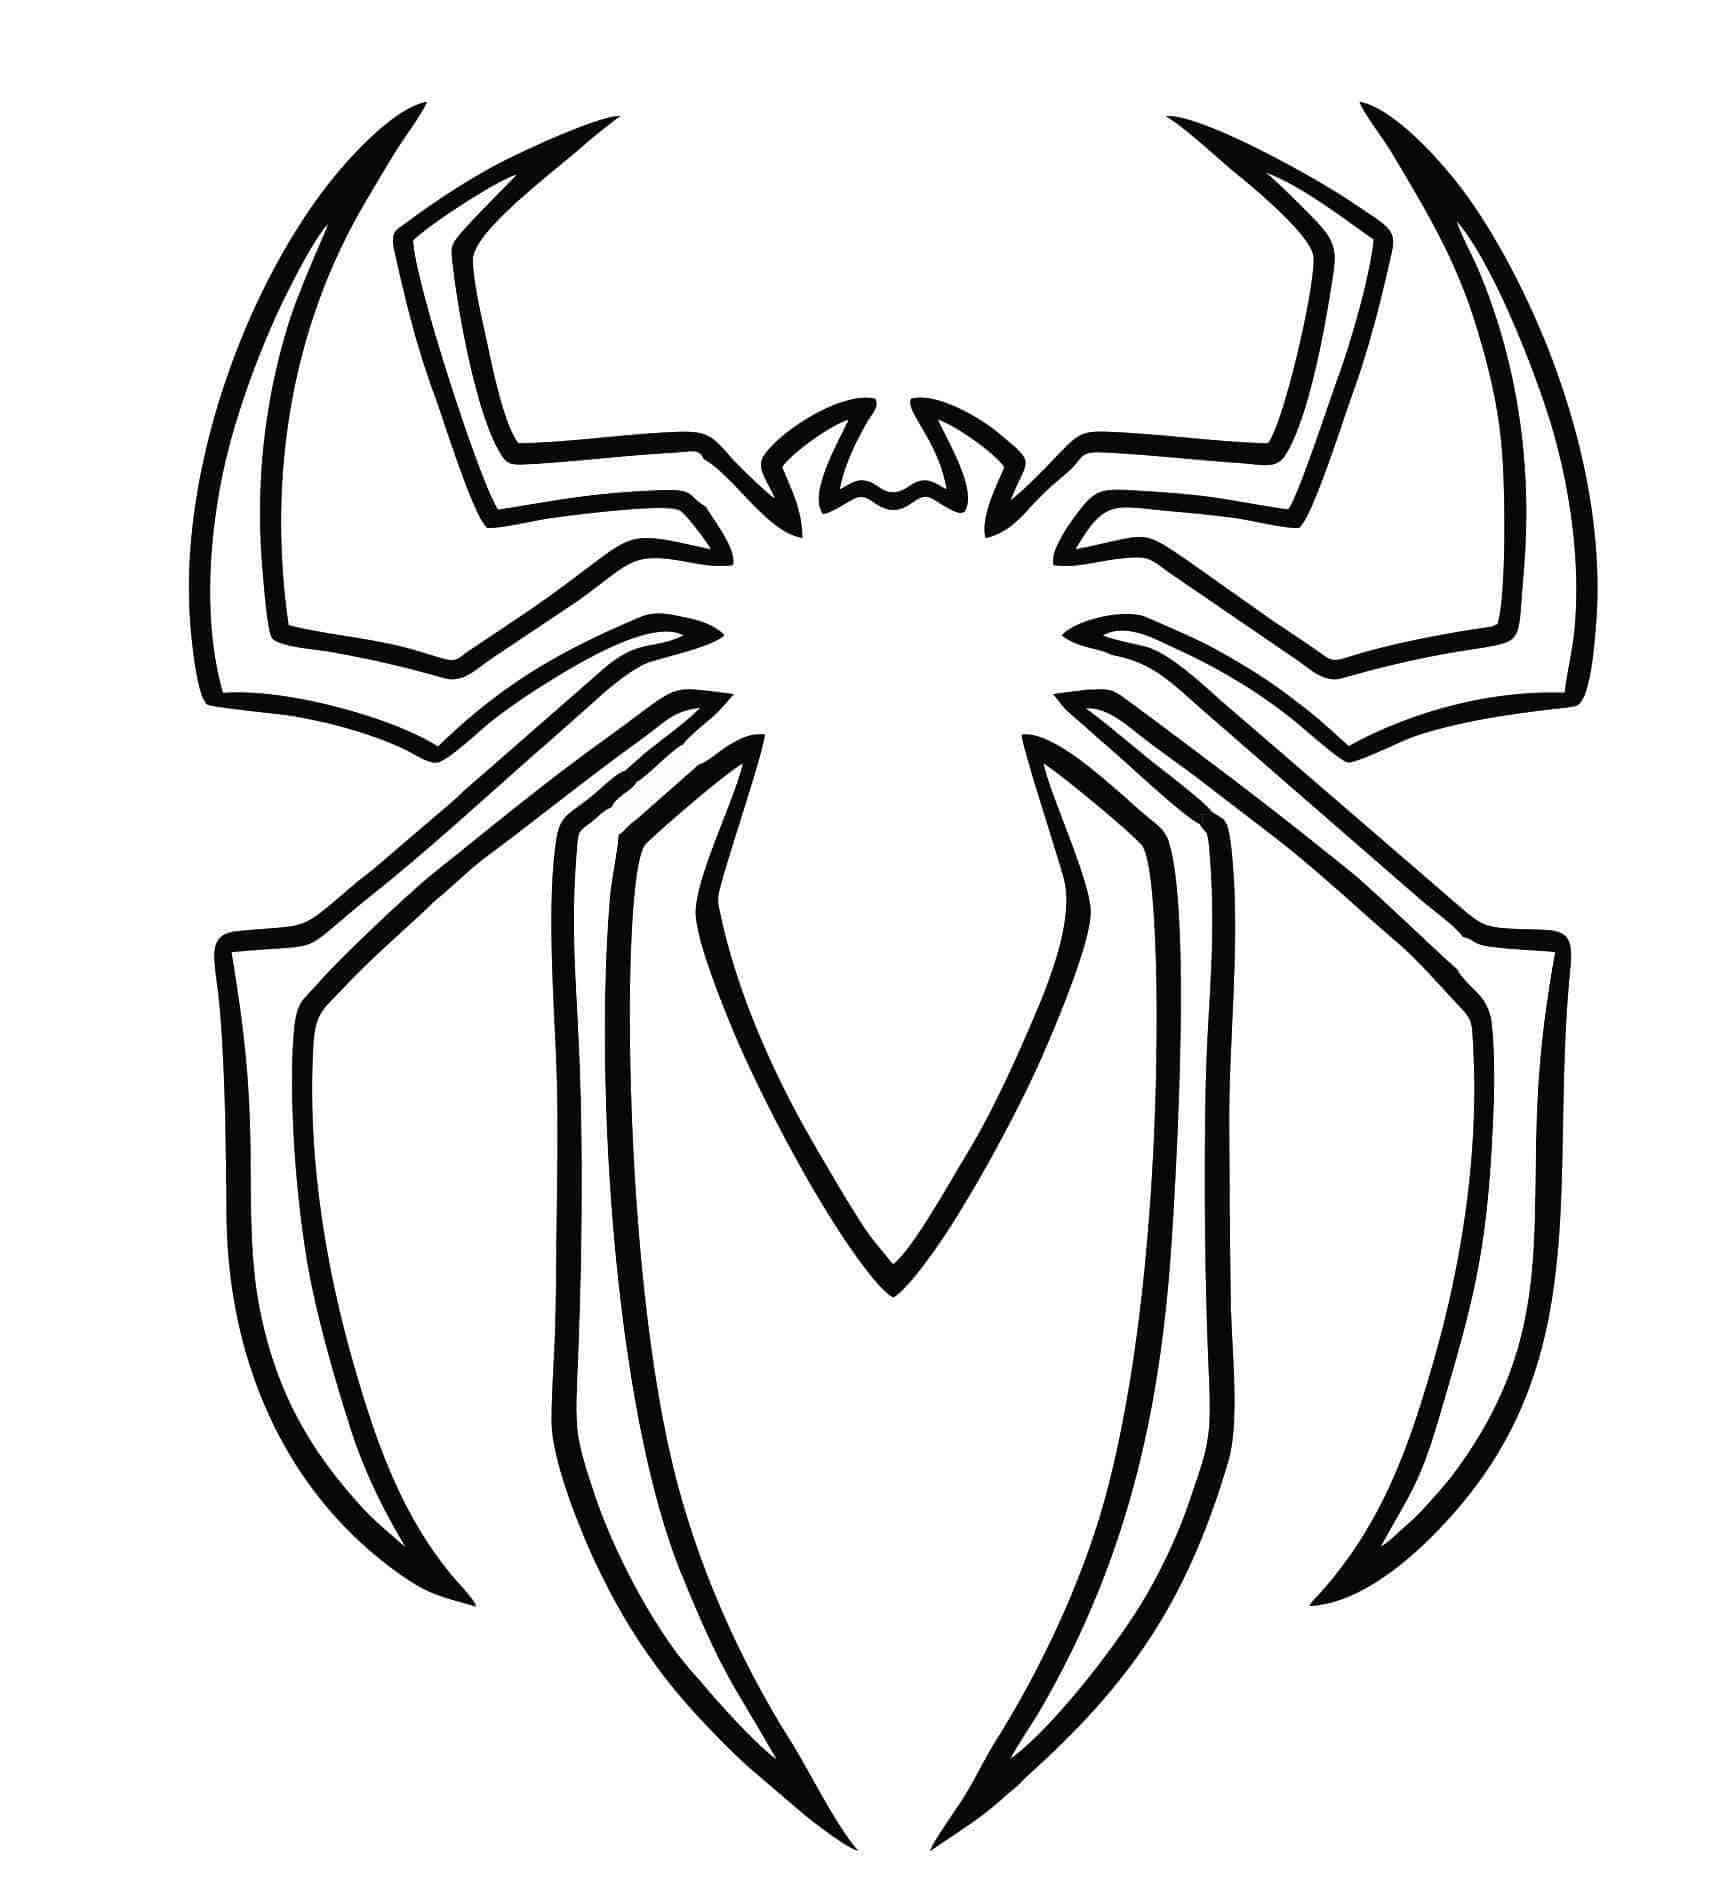 Aranha para colorir